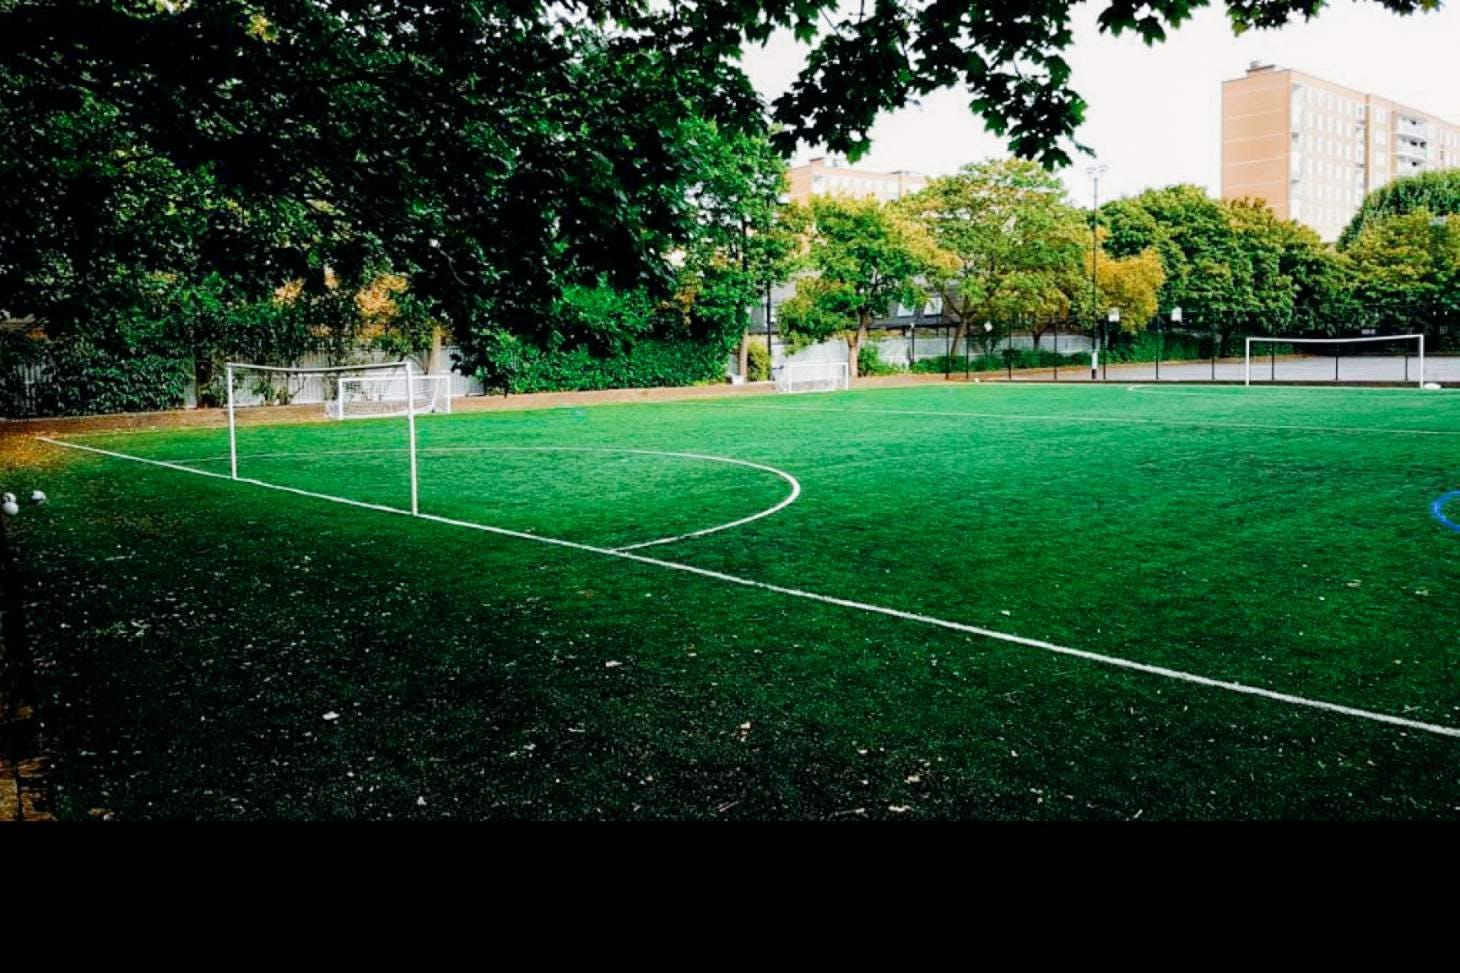 Harris Academy Battersea 7 a side | 3G Astroturf football pitch